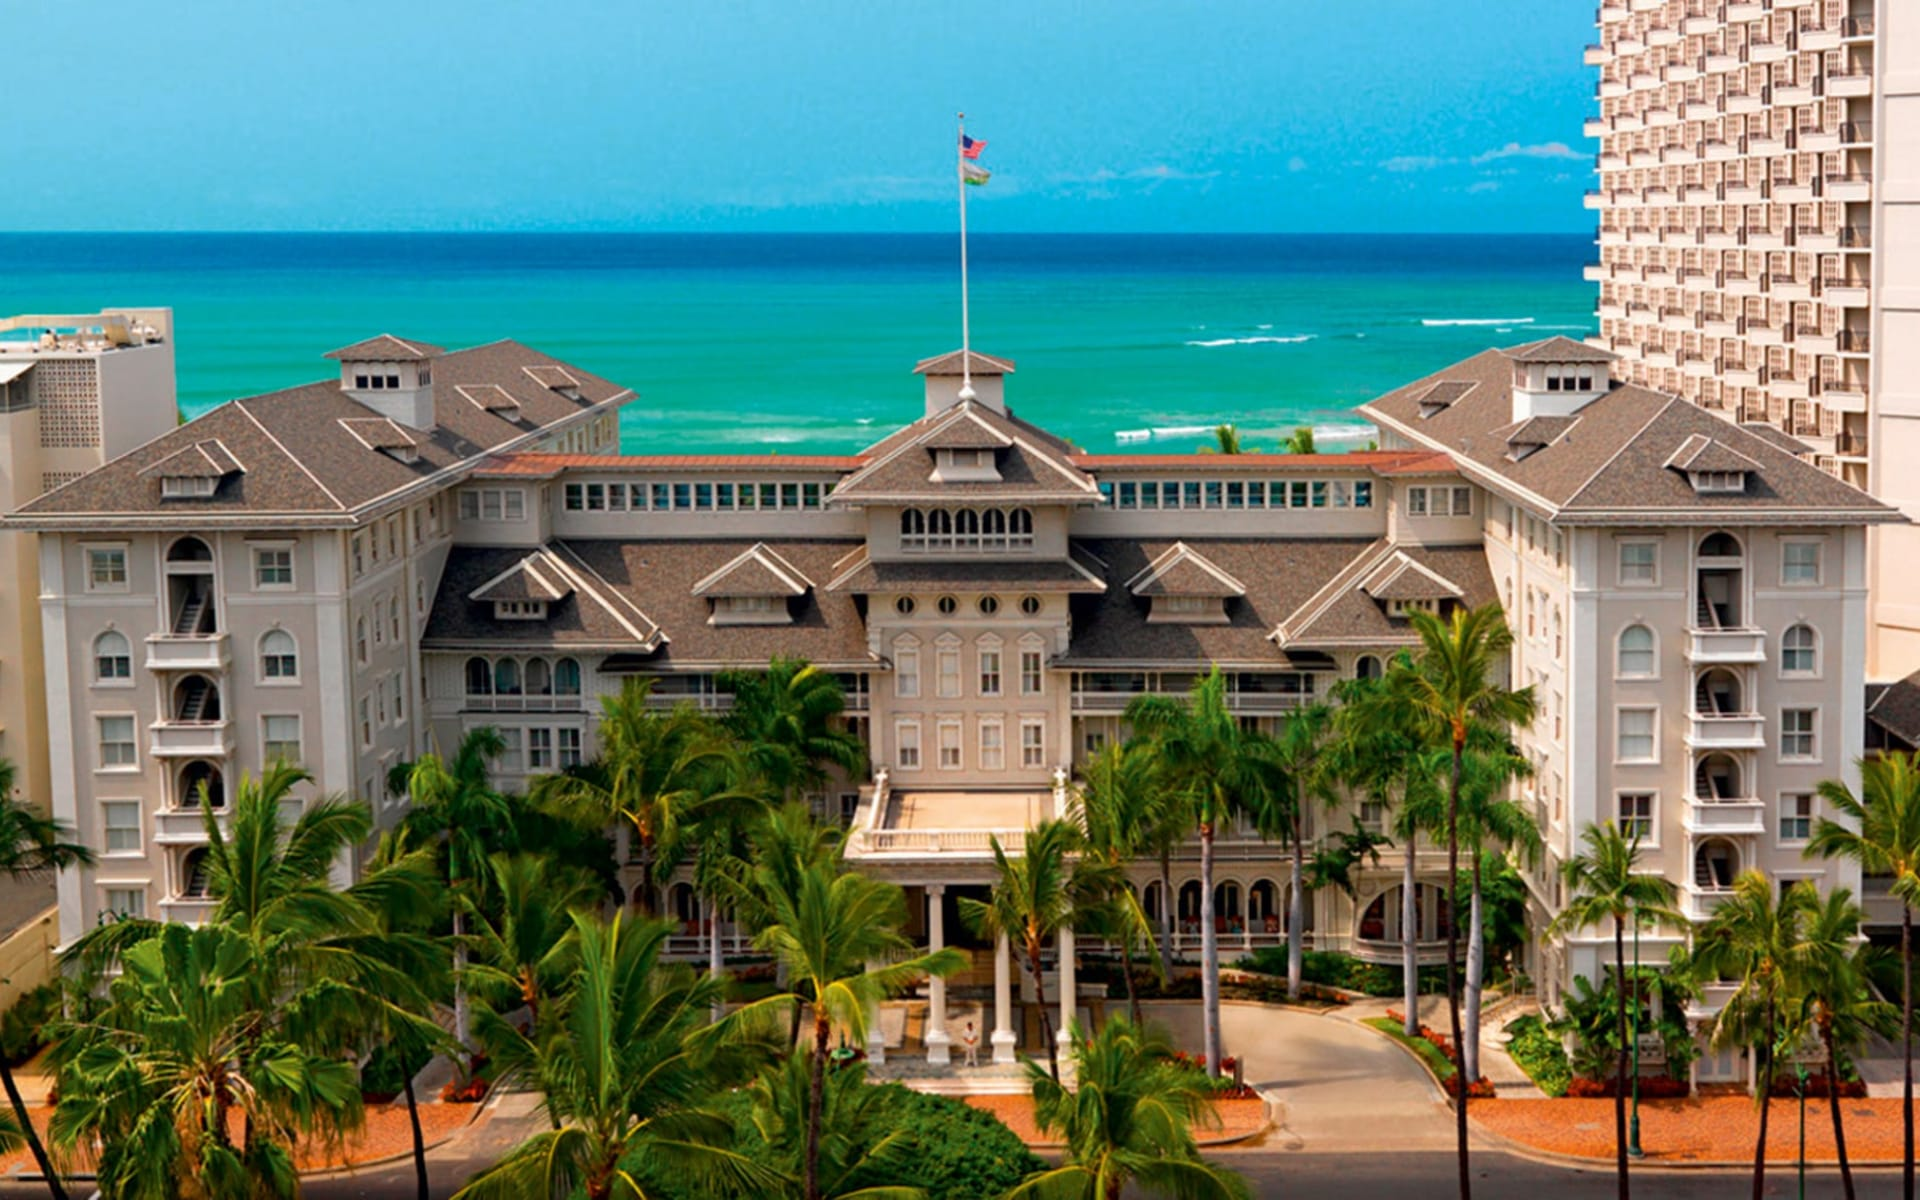 Moana Surfrider, a Westin Resort in Honolulu - Oahu:  Moana Surfrider - a Westin Resort - Aussenansicht